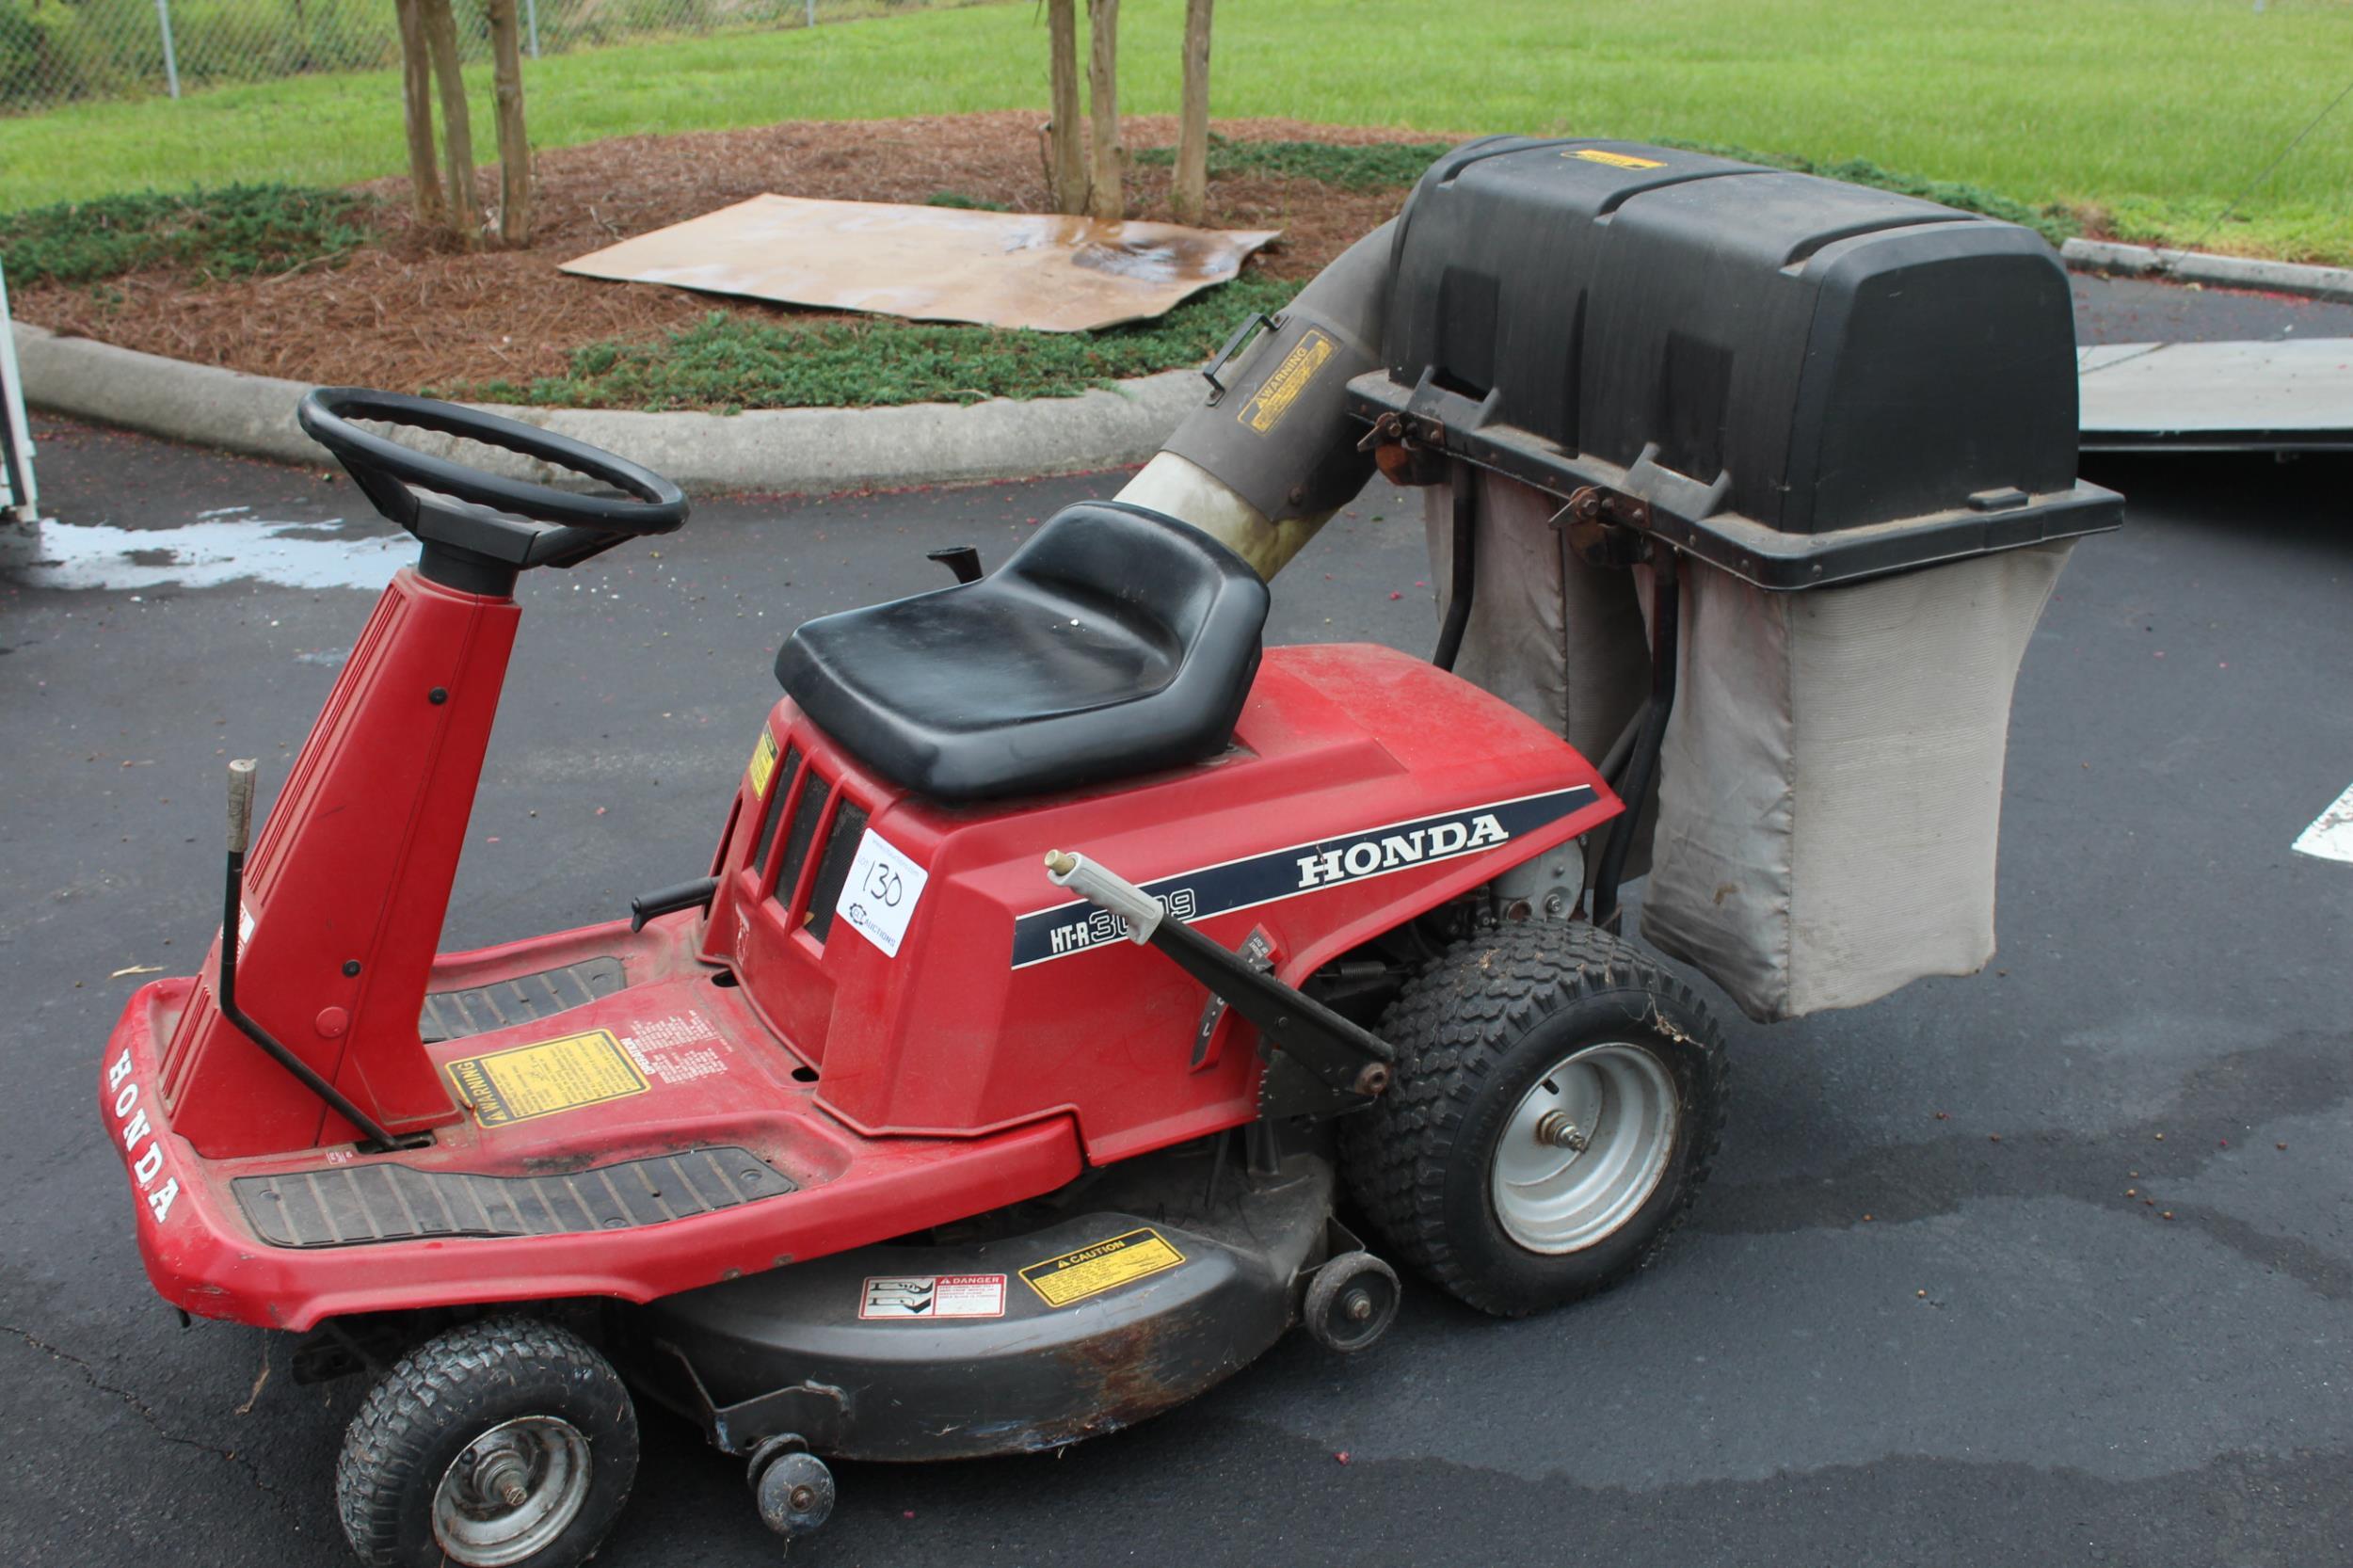 Honda ht r 3009 riding mower w bagger does not start lot 130 honda ht r 3009 riding mower w bagger does not start fandeluxe Gallery